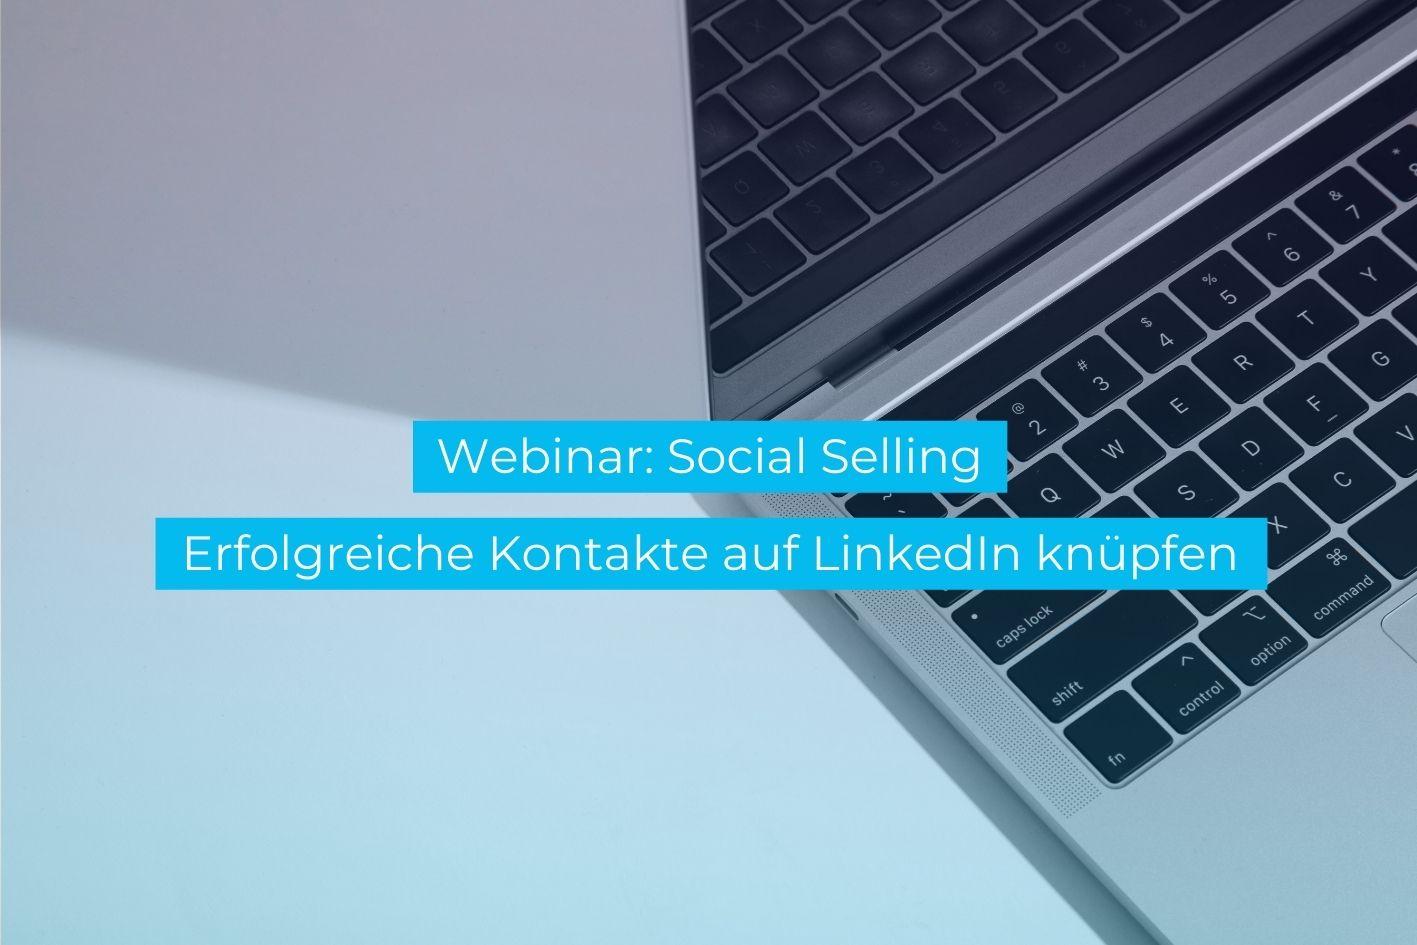 Webinar Social Selling. Wie Sie auf LinkedIn gewinnbringende Kontakte knüpfen